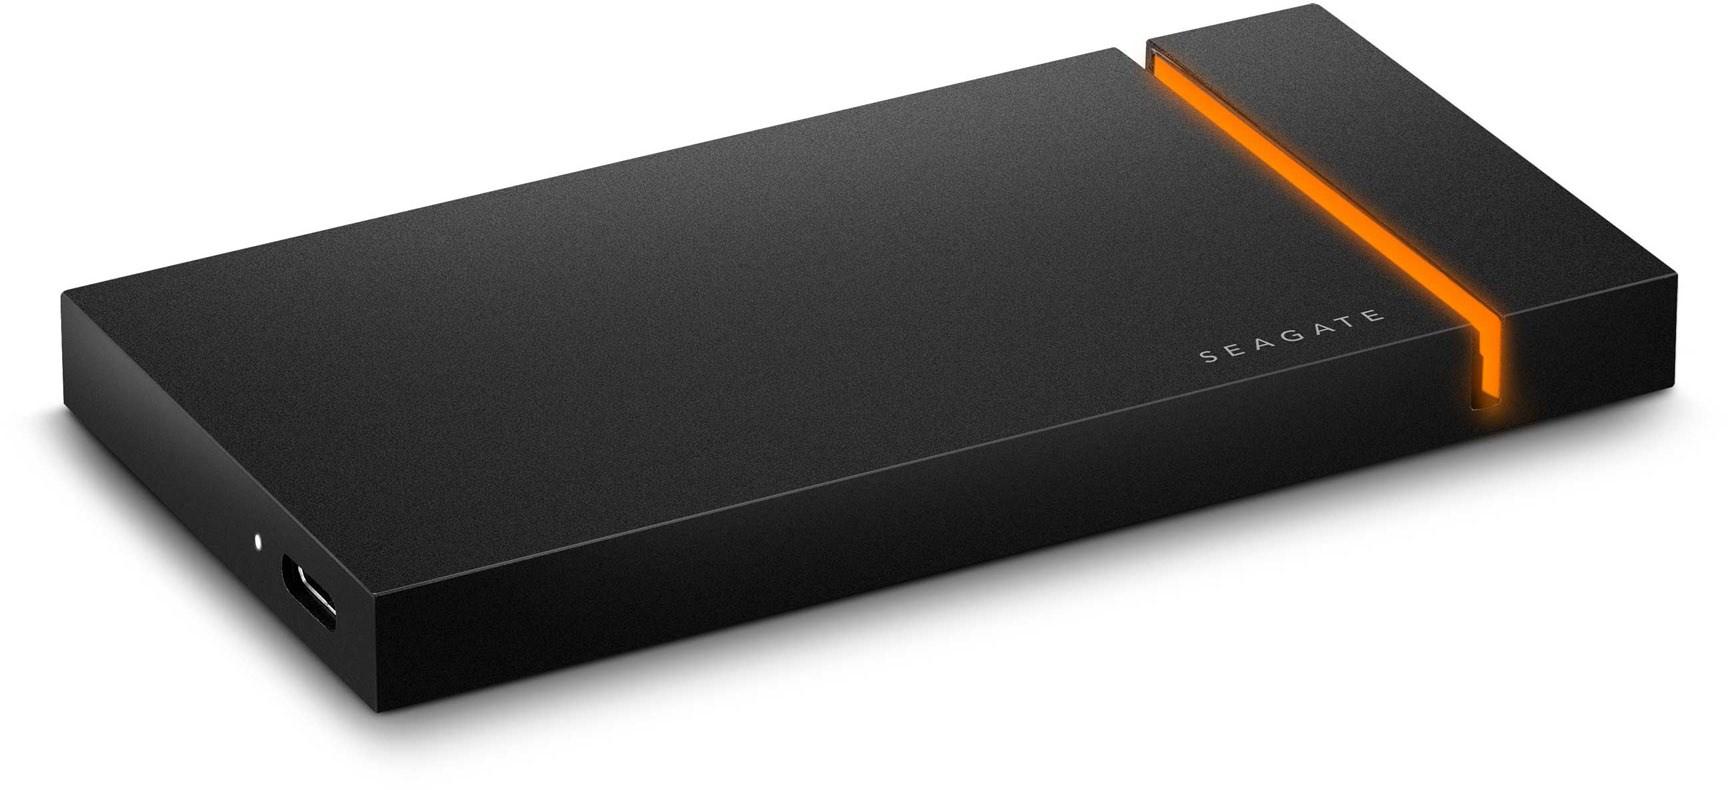 Seagate Firecuda Gaming SSD 500 GB Externe SSD schwarz